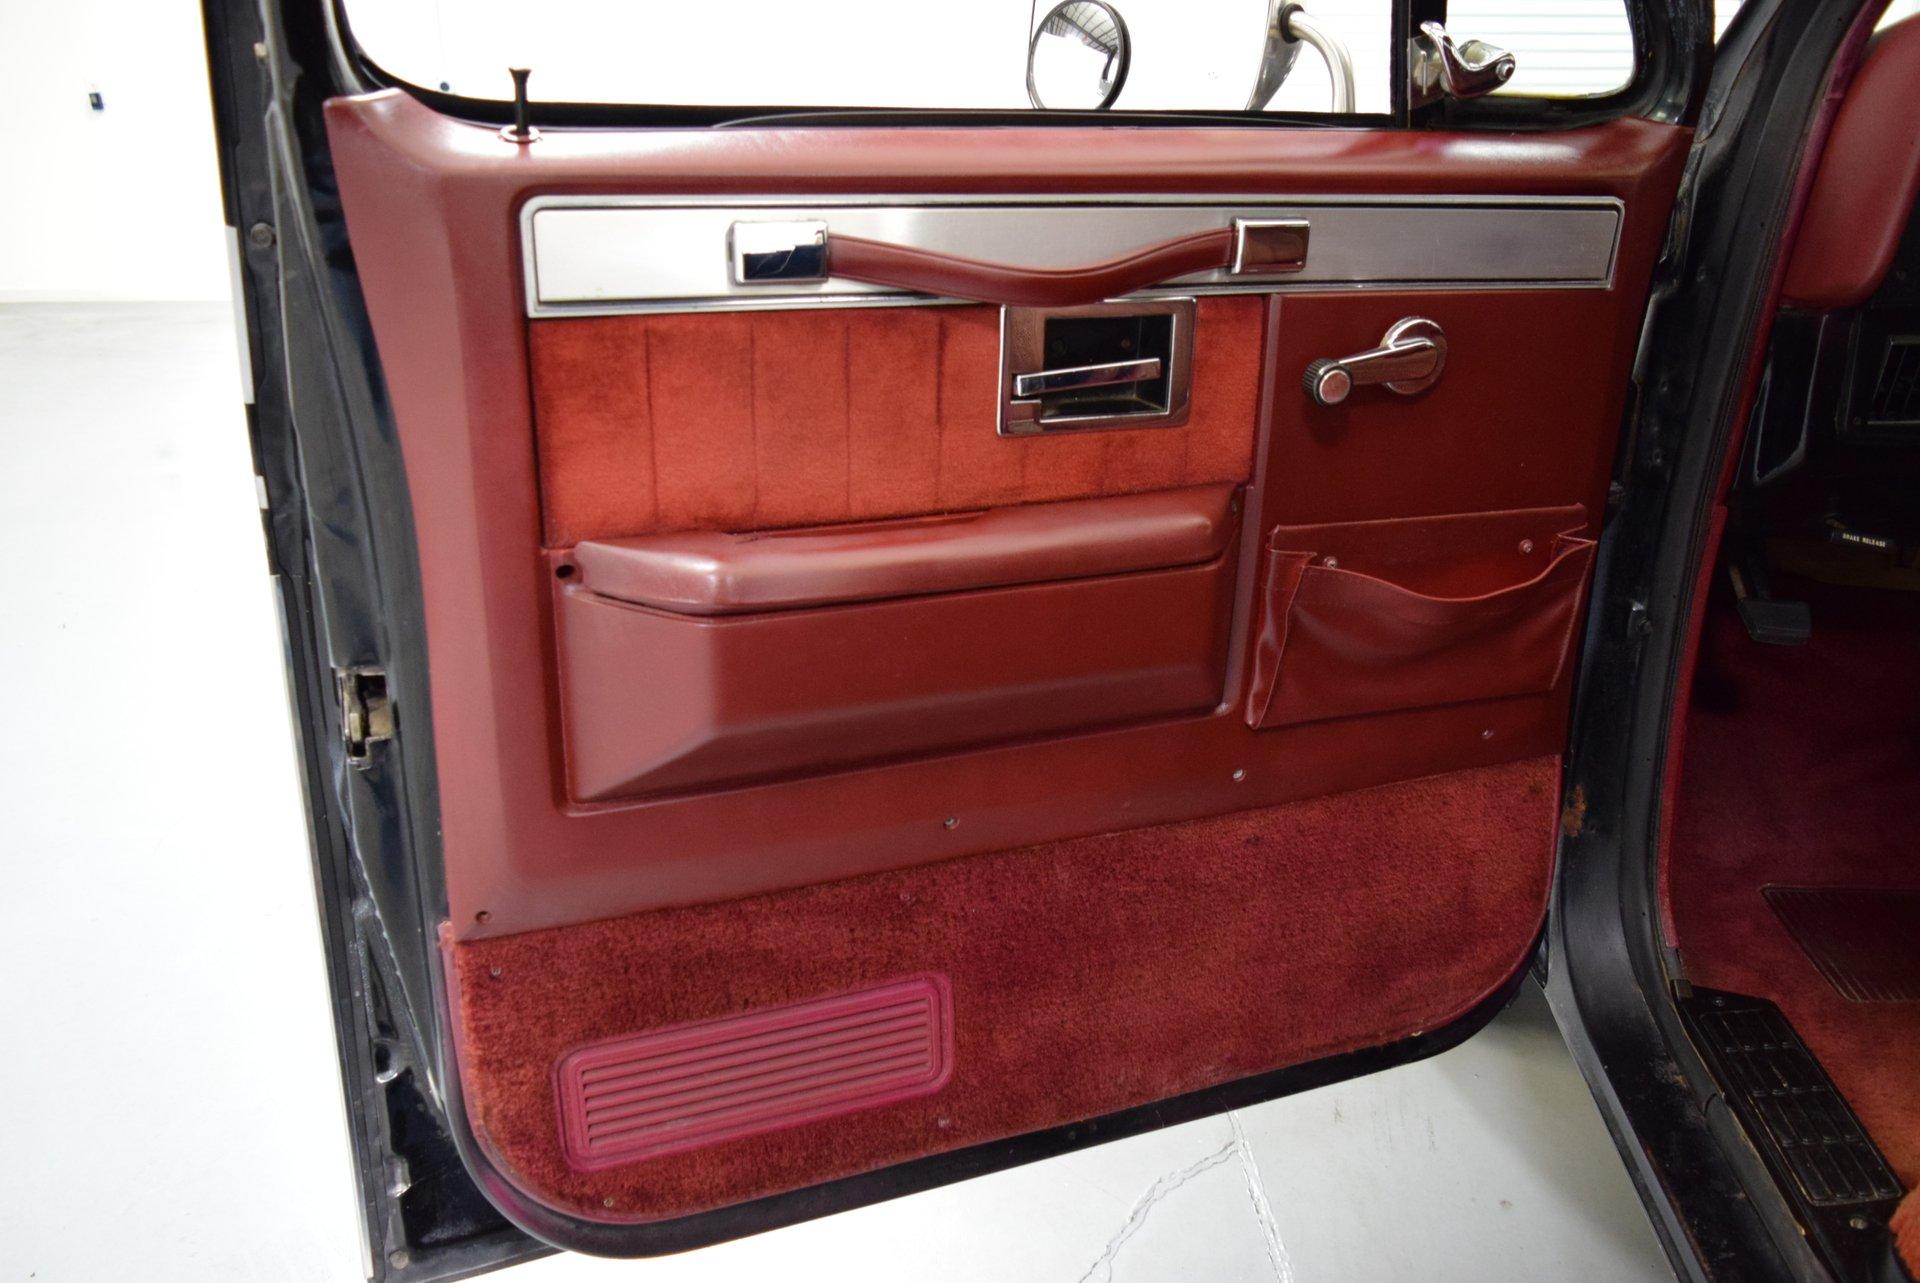 1987 Chevrolet R10 | Shelton Classics & Performance